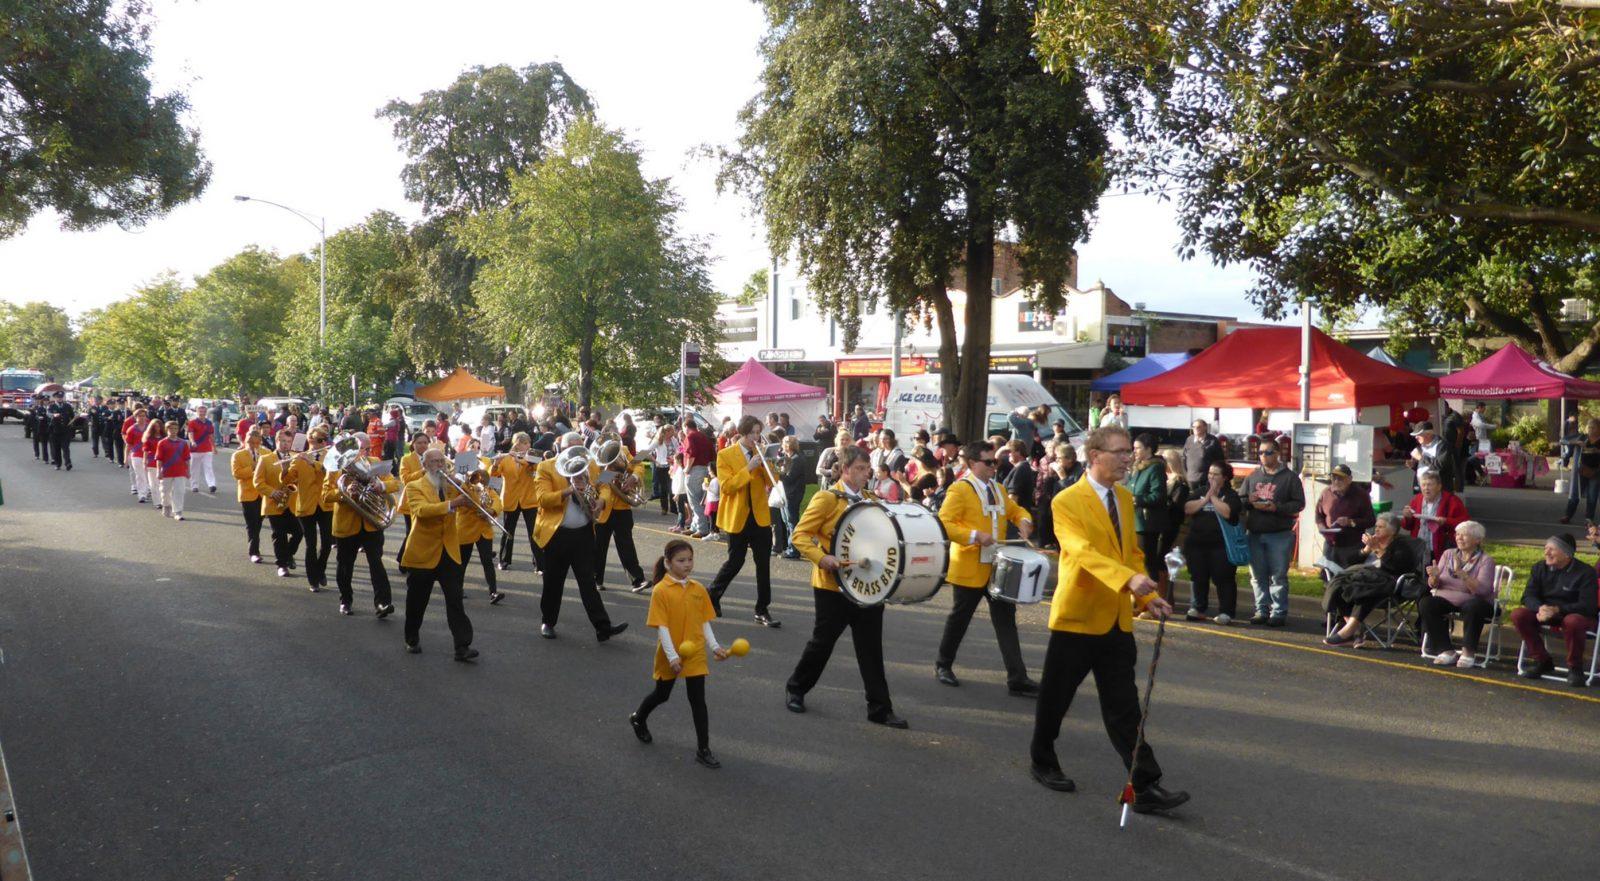 Maffra Mardi Gras